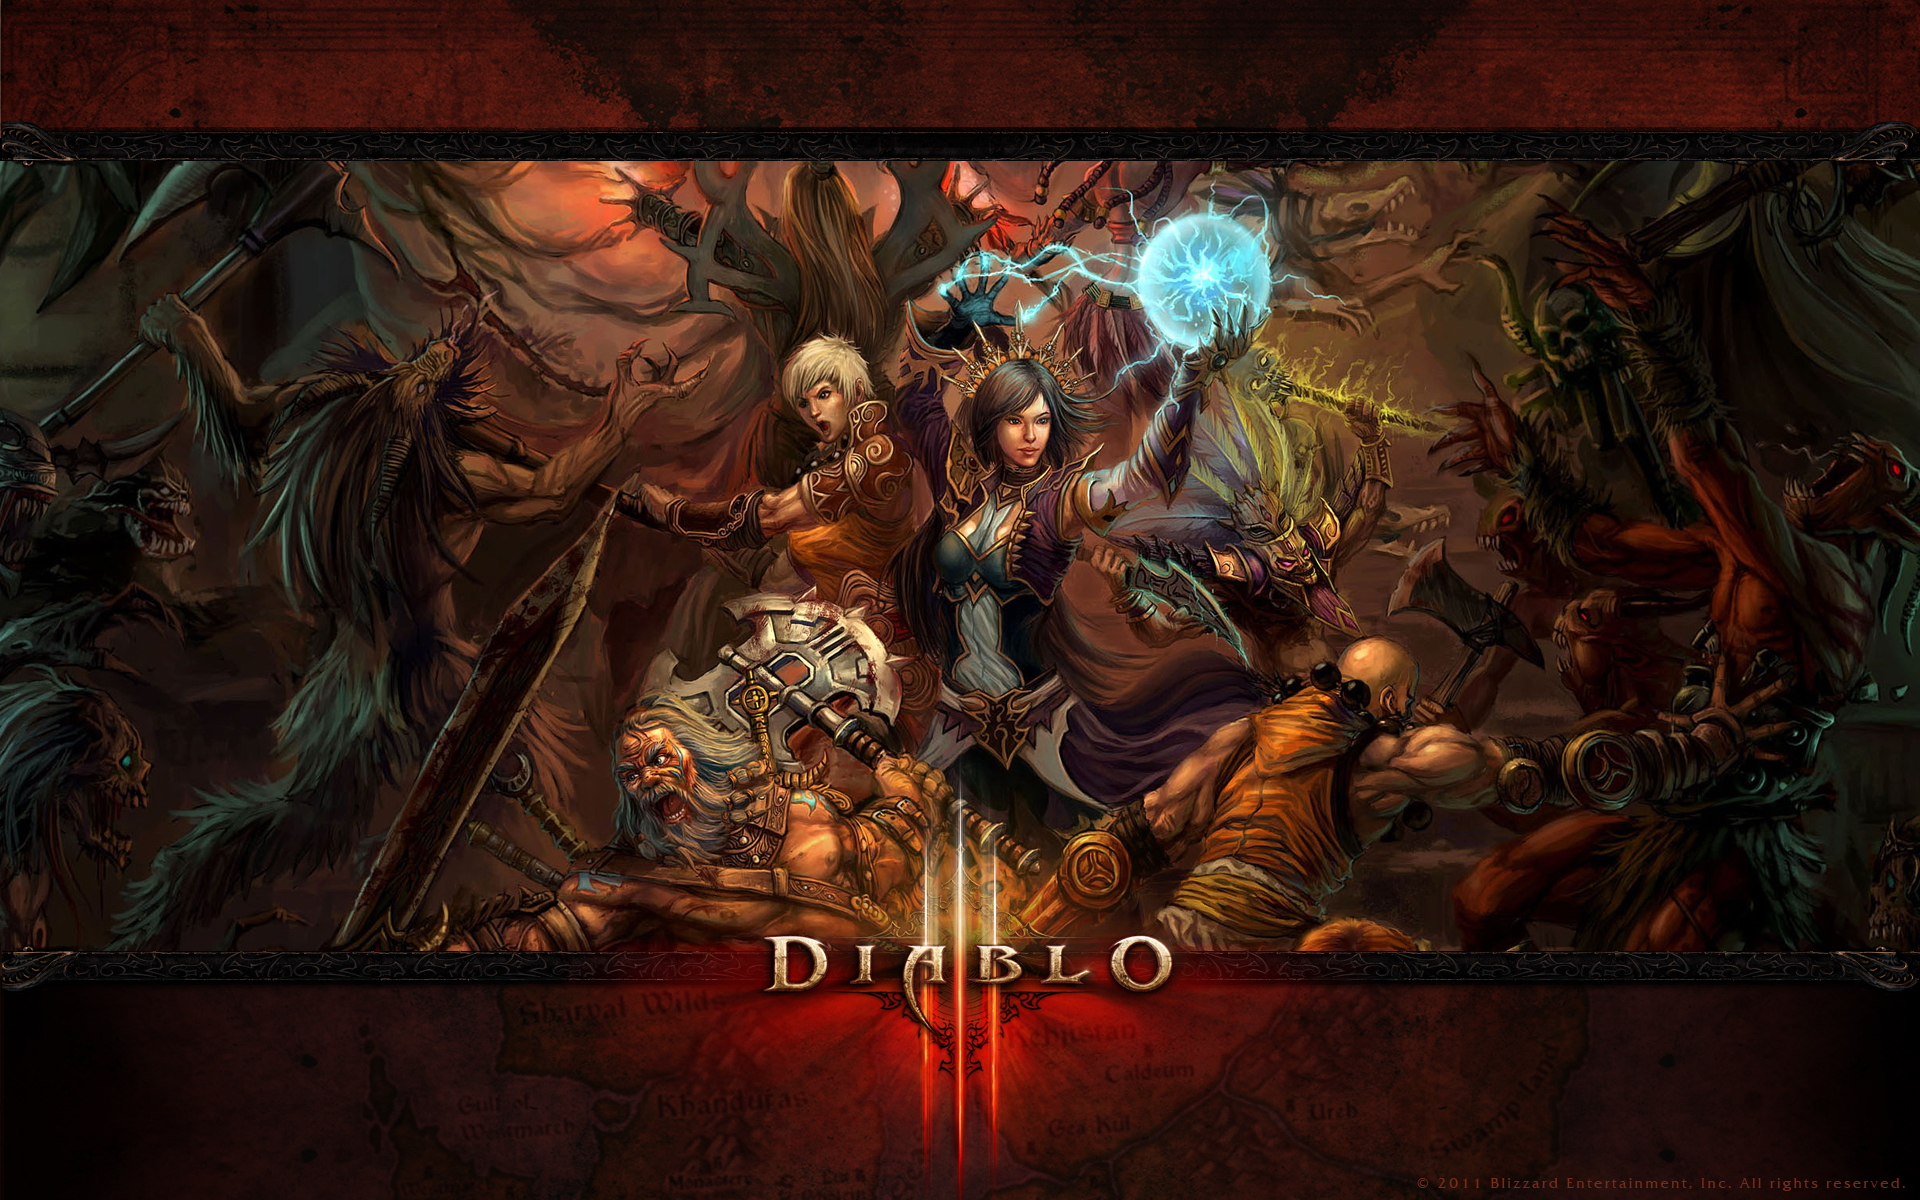 50 Hd Diablo 3 Wallpaper On Wallpapersafari